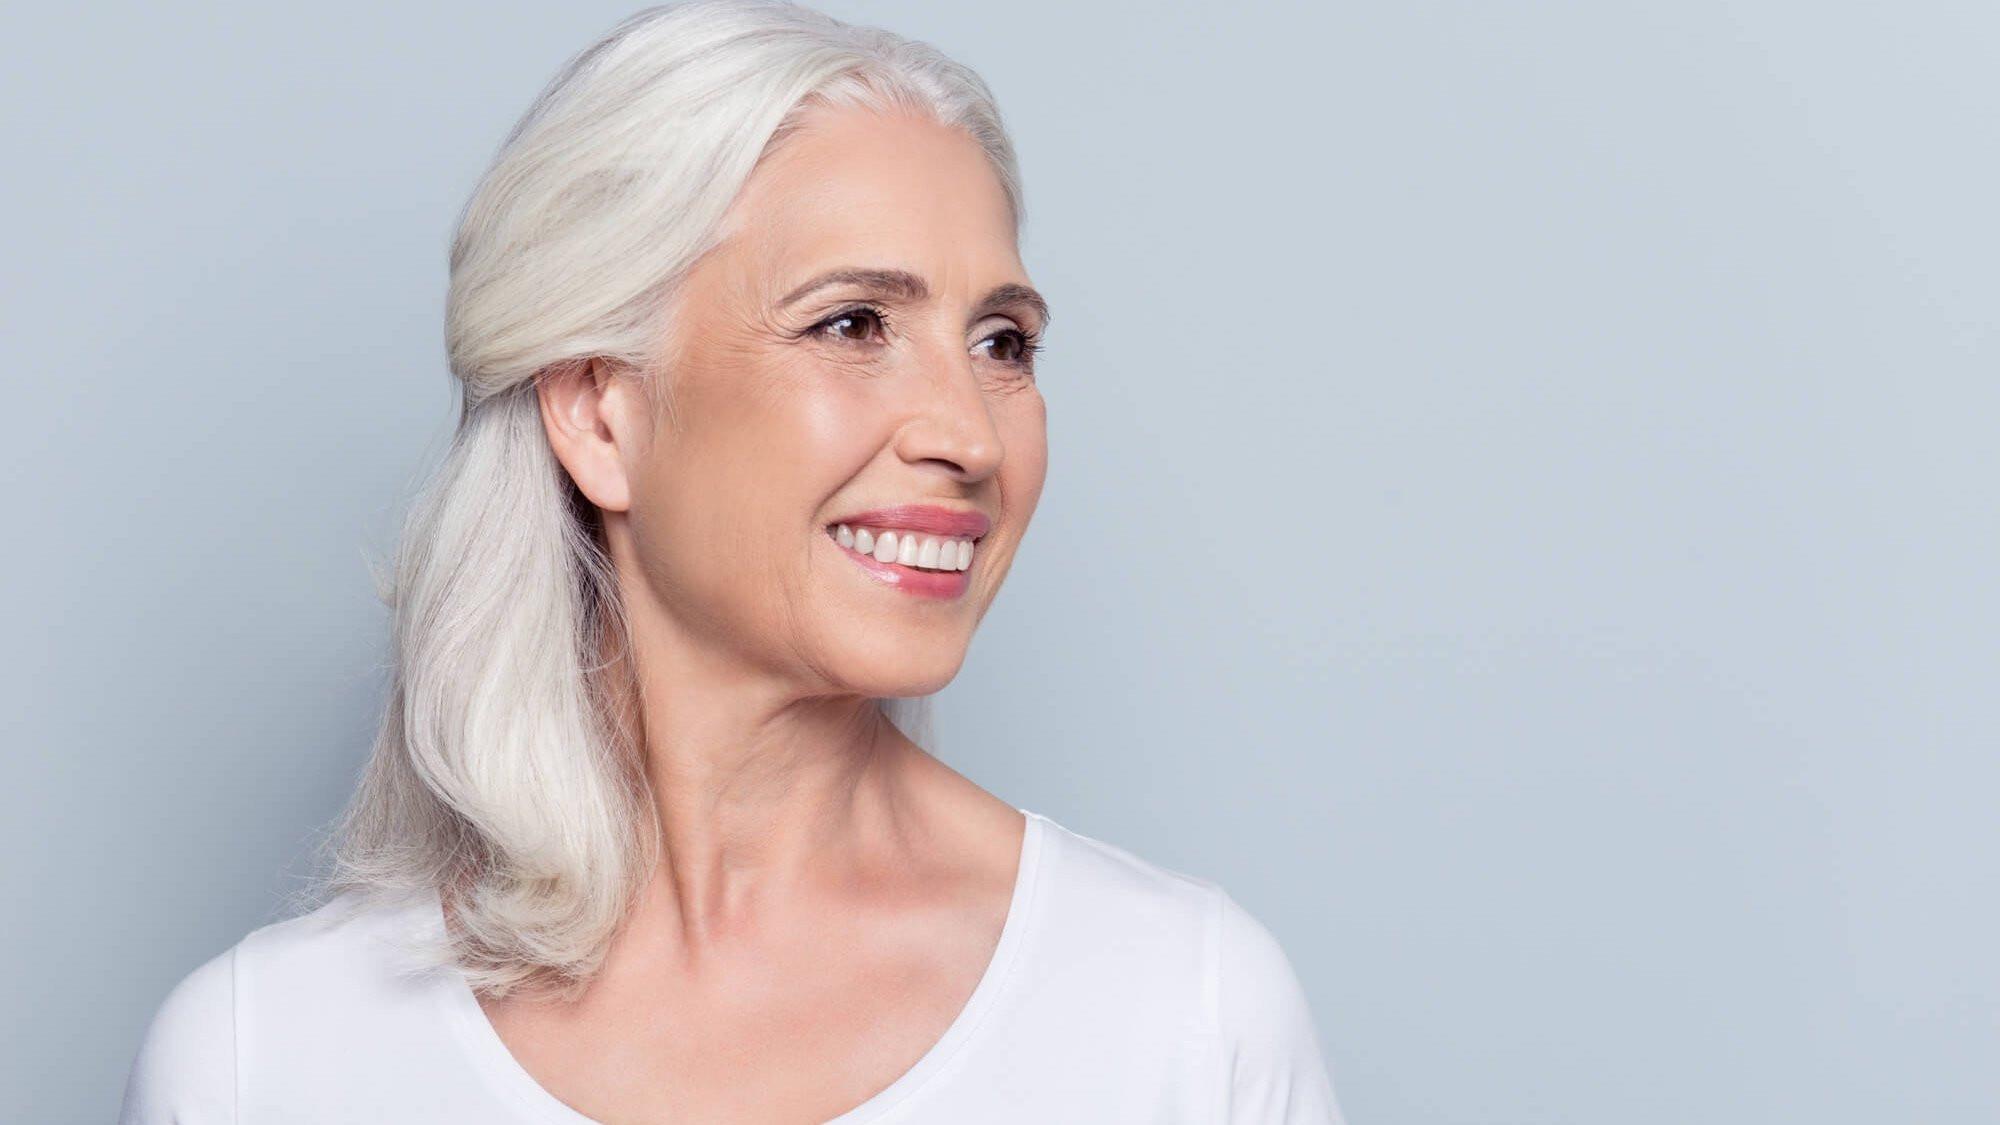 Graue Haare Frisuren Vorschläge  Graue Haare Frisuren und Trends bei grauen Haaren